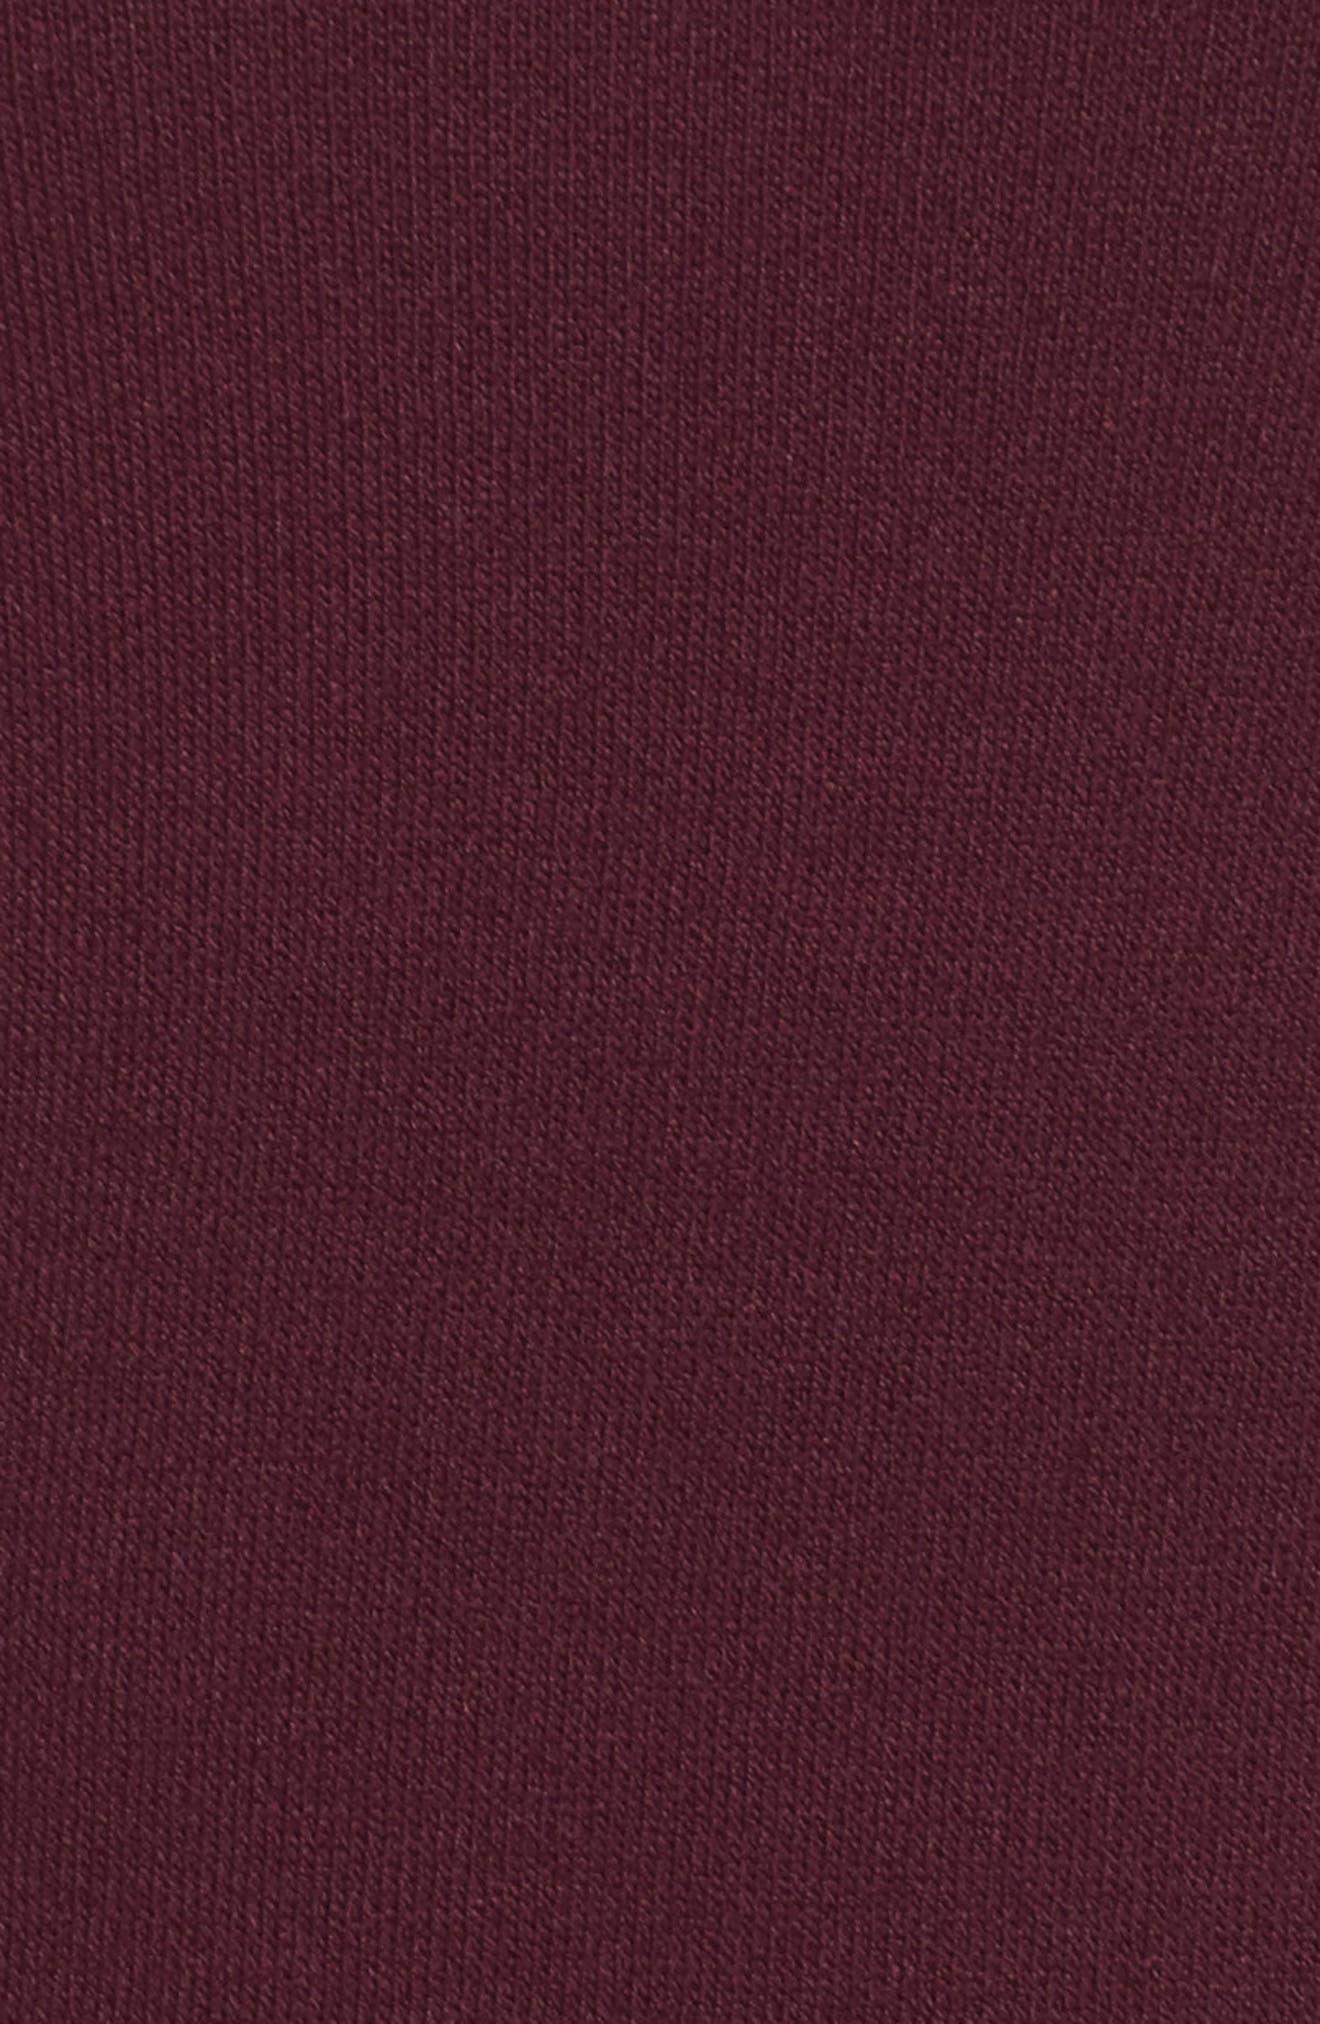 Cold Shoulder Knit Body-Con Dress,                             Alternate thumbnail 5, color,                             Aubergine